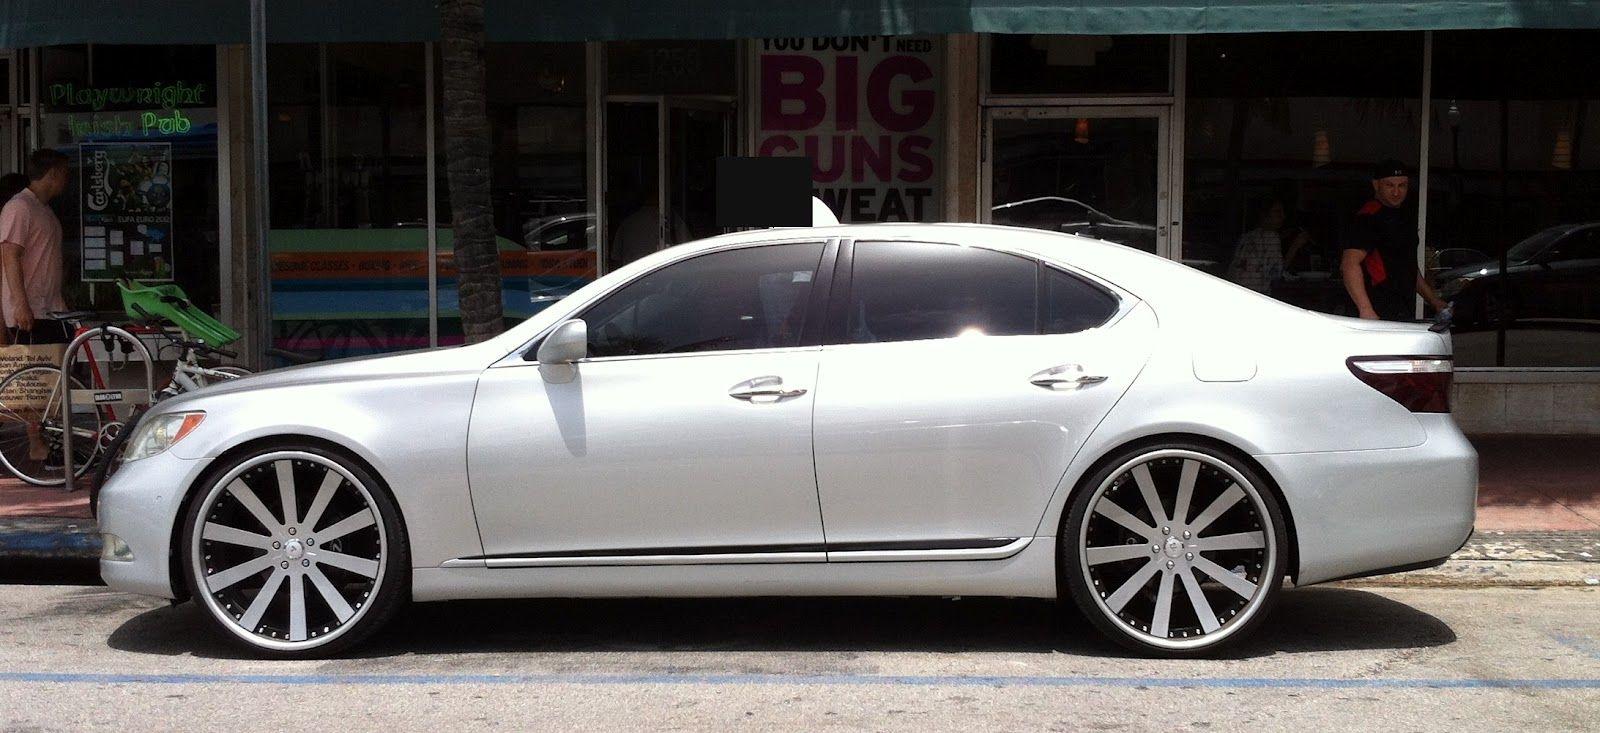 Lexus LS 460 Custom Wheels Find the Classic Rims of Your